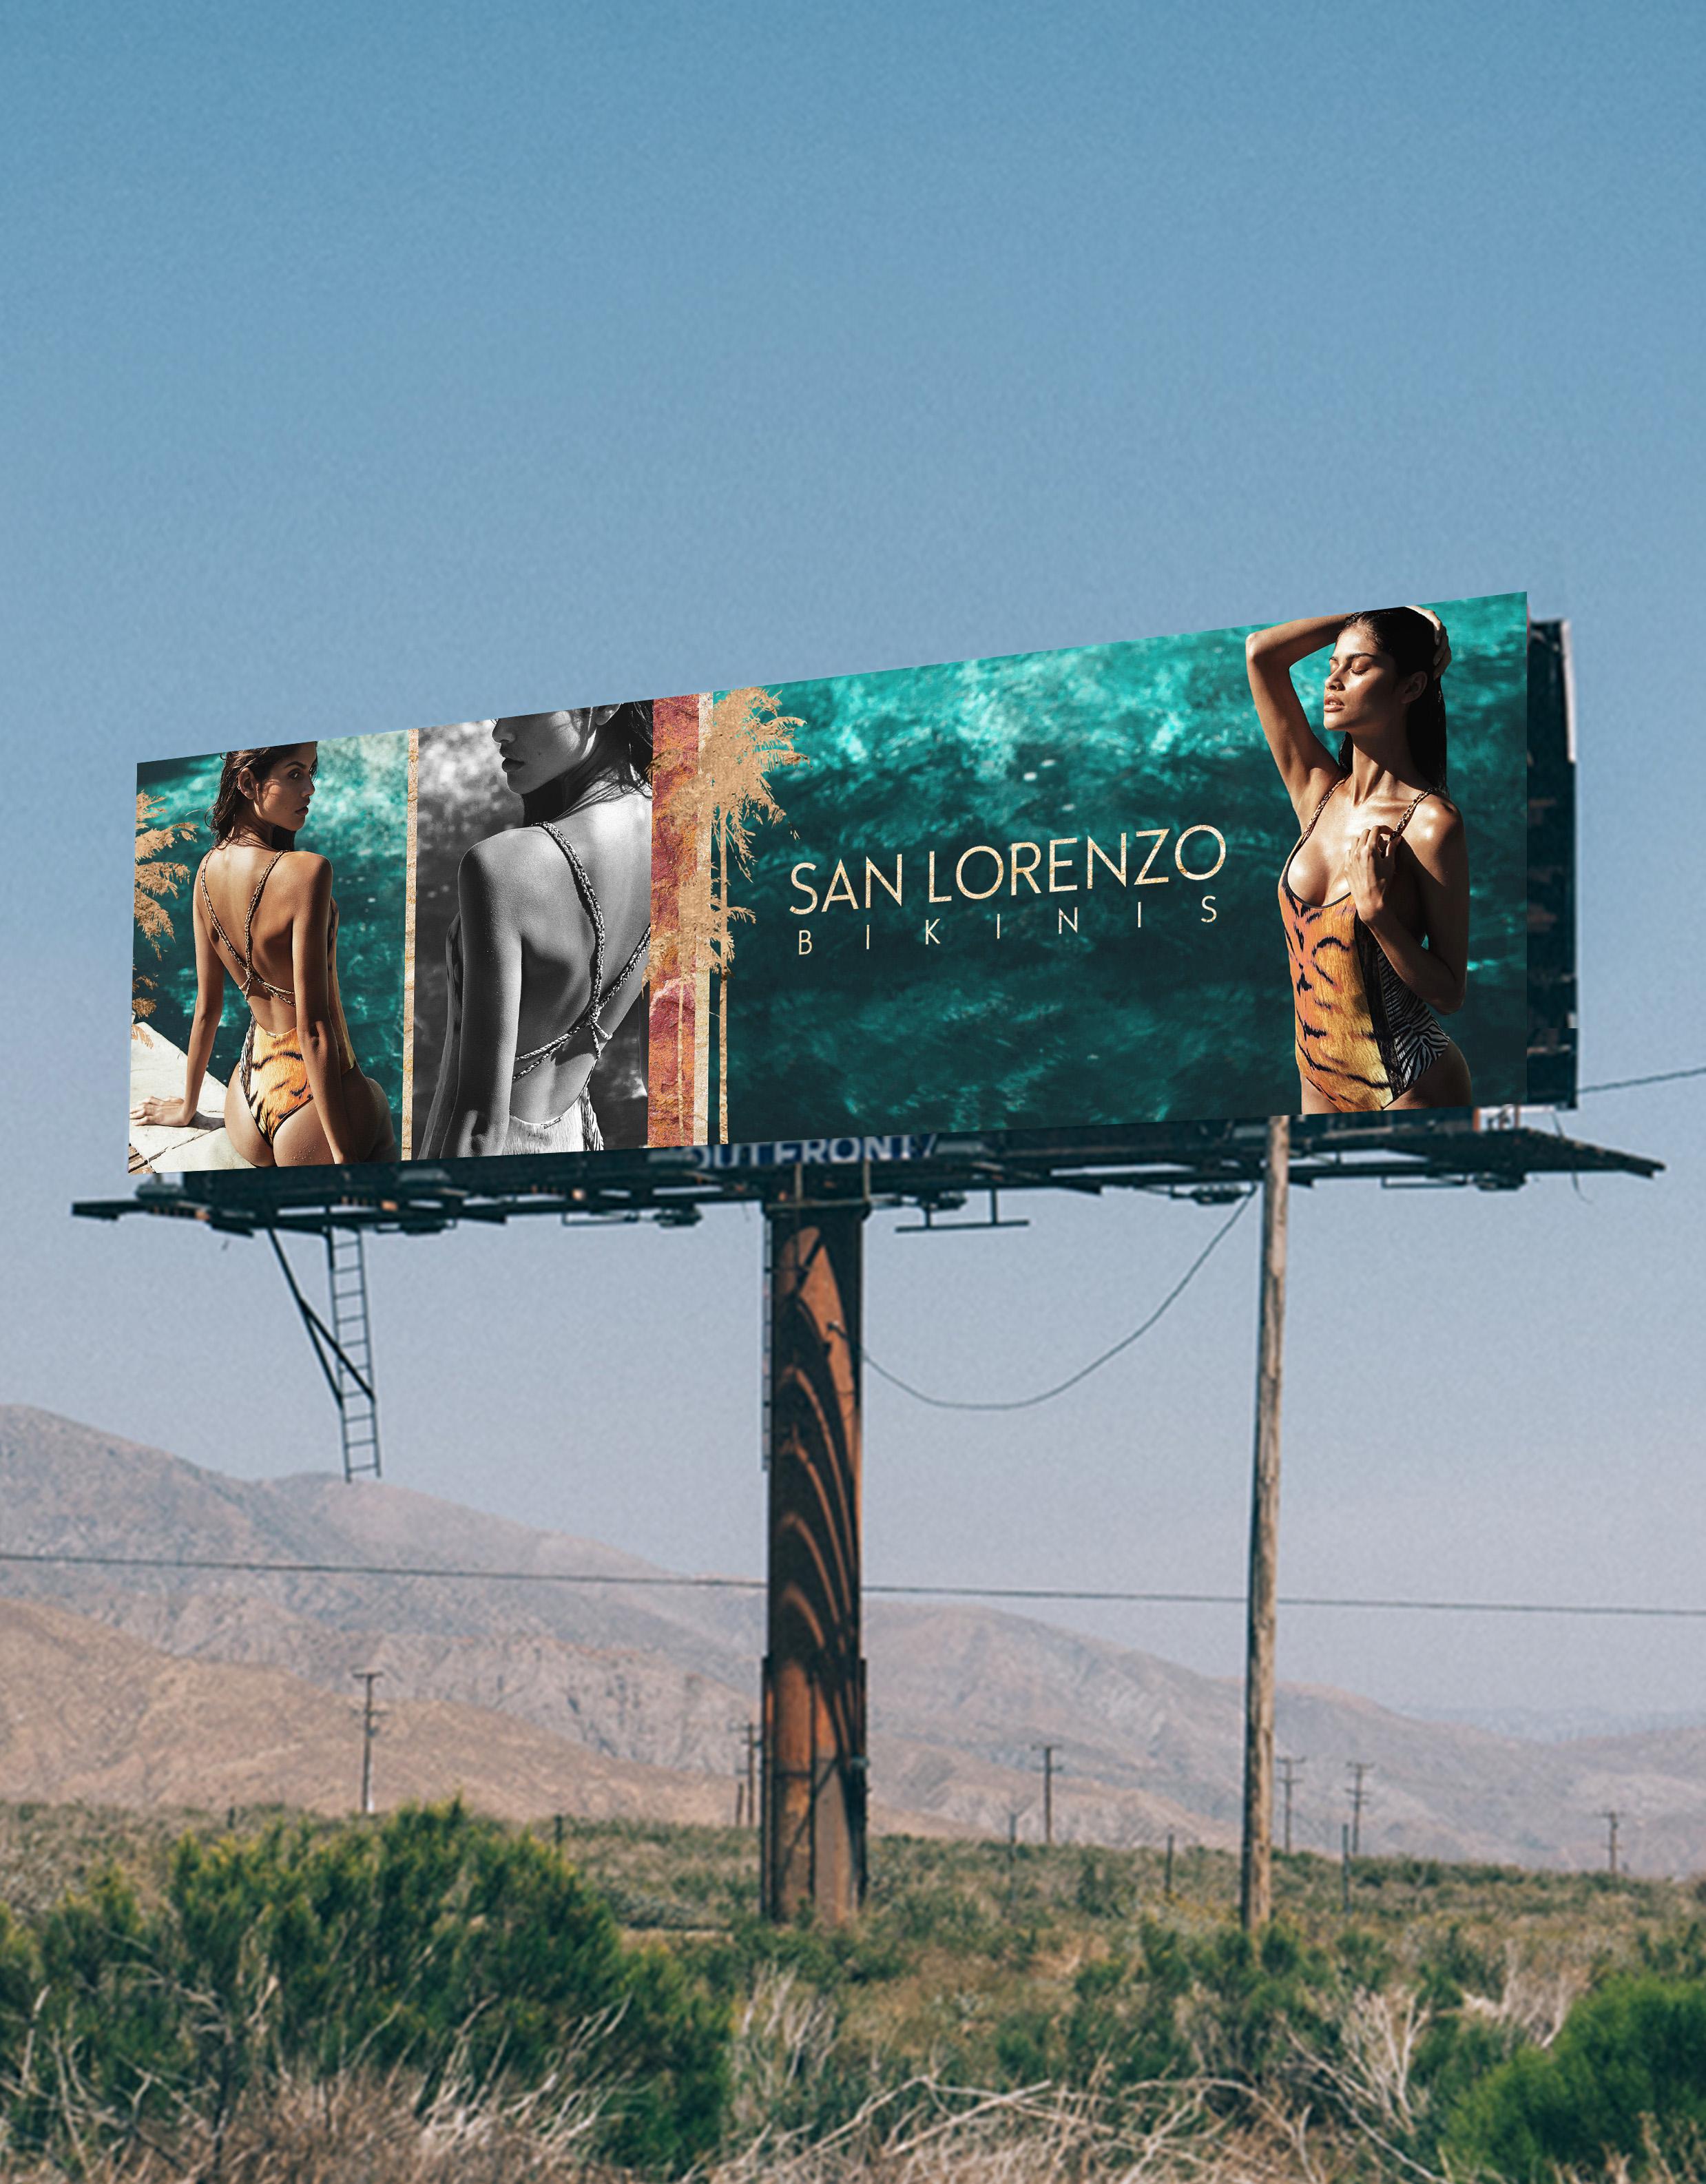 Billboard in California - on the road to Coachella